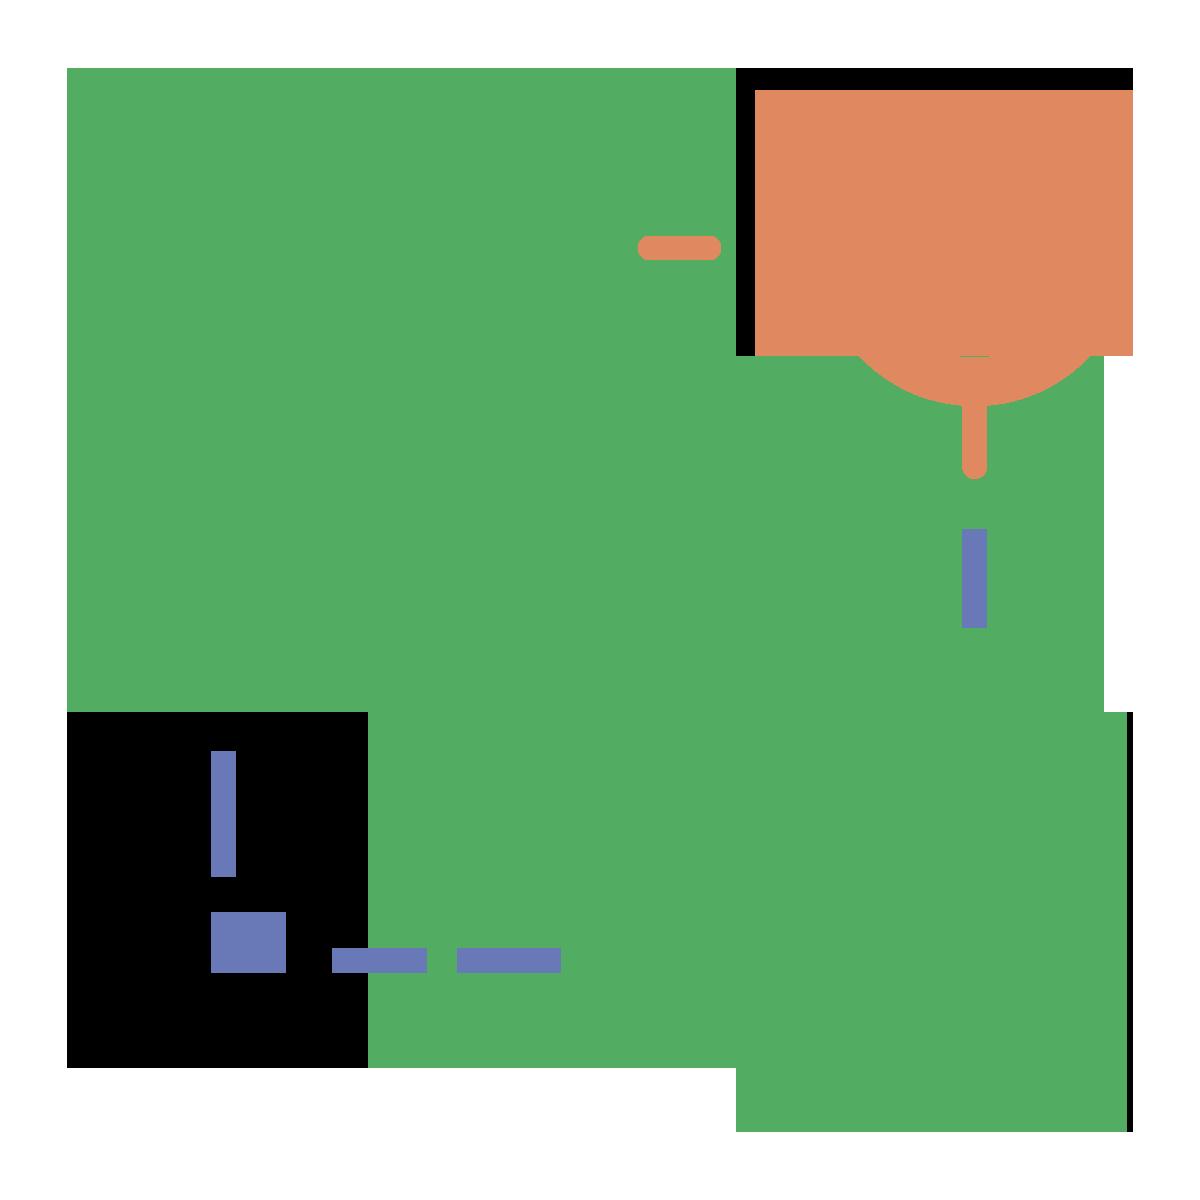 noun_Automata Theory_1119901_000000.png